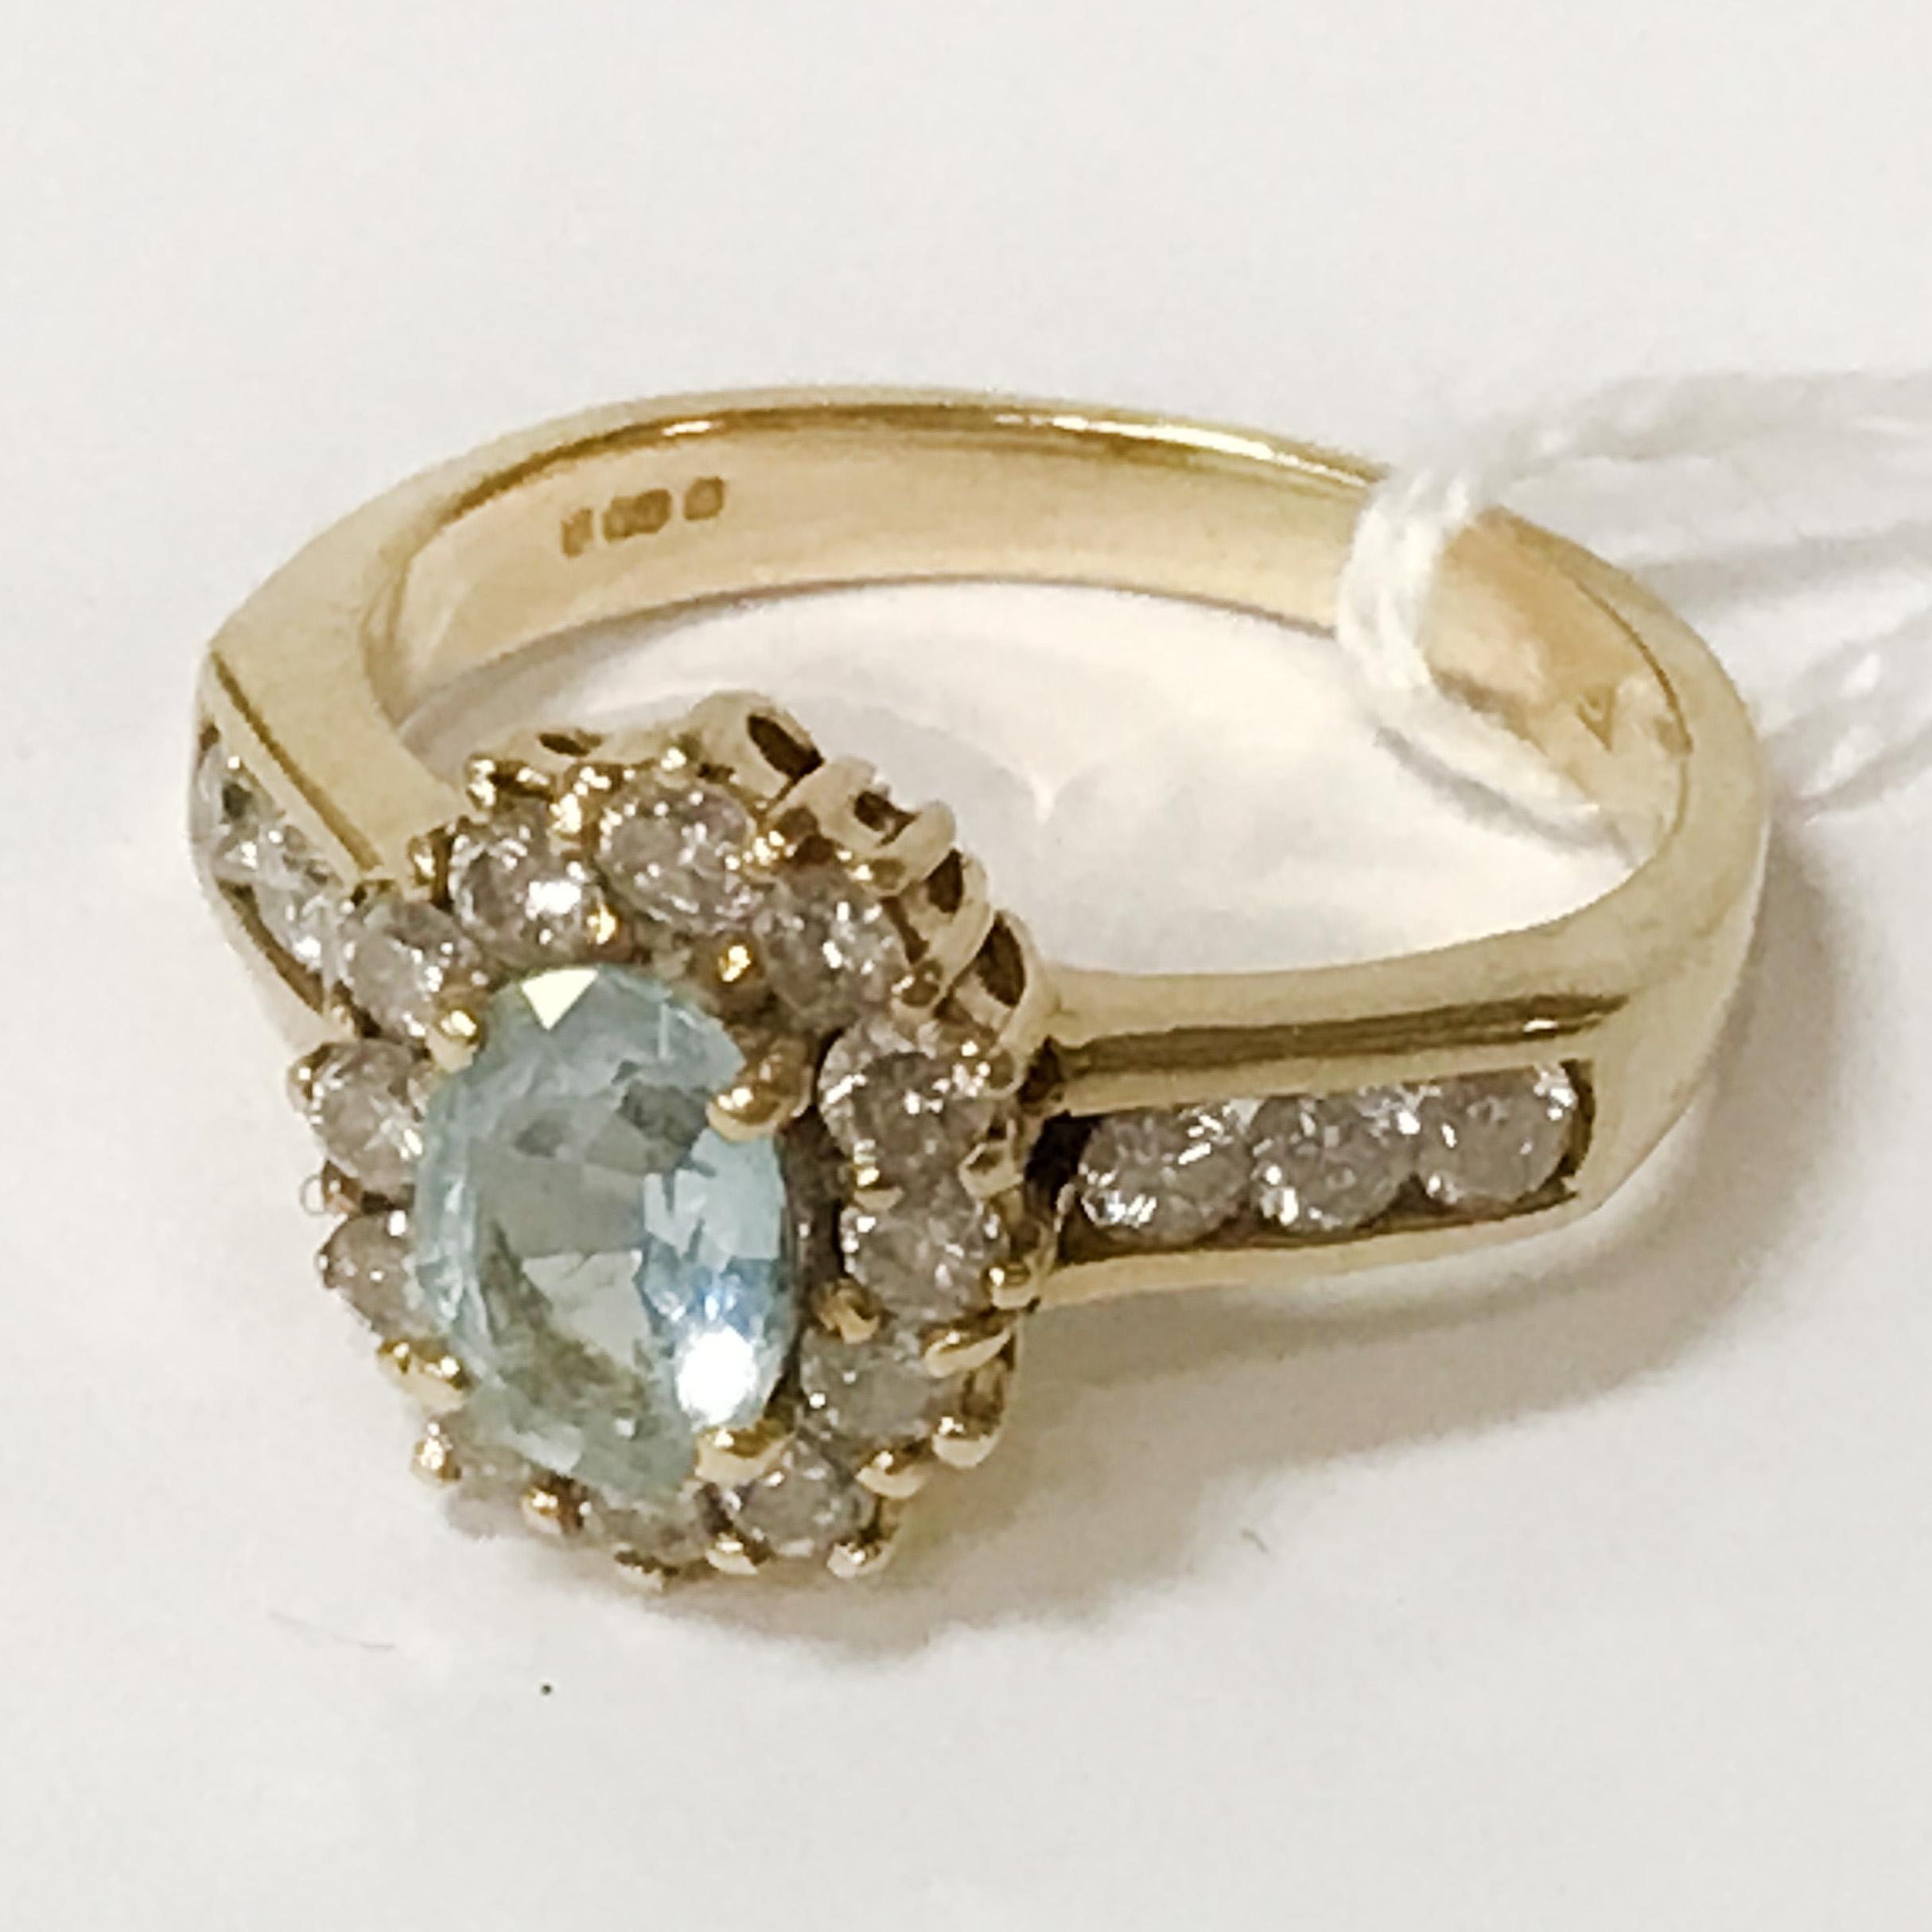 18CT YELLOW GOLD AQUAMARINE& DIAMOND RING - SIZE M